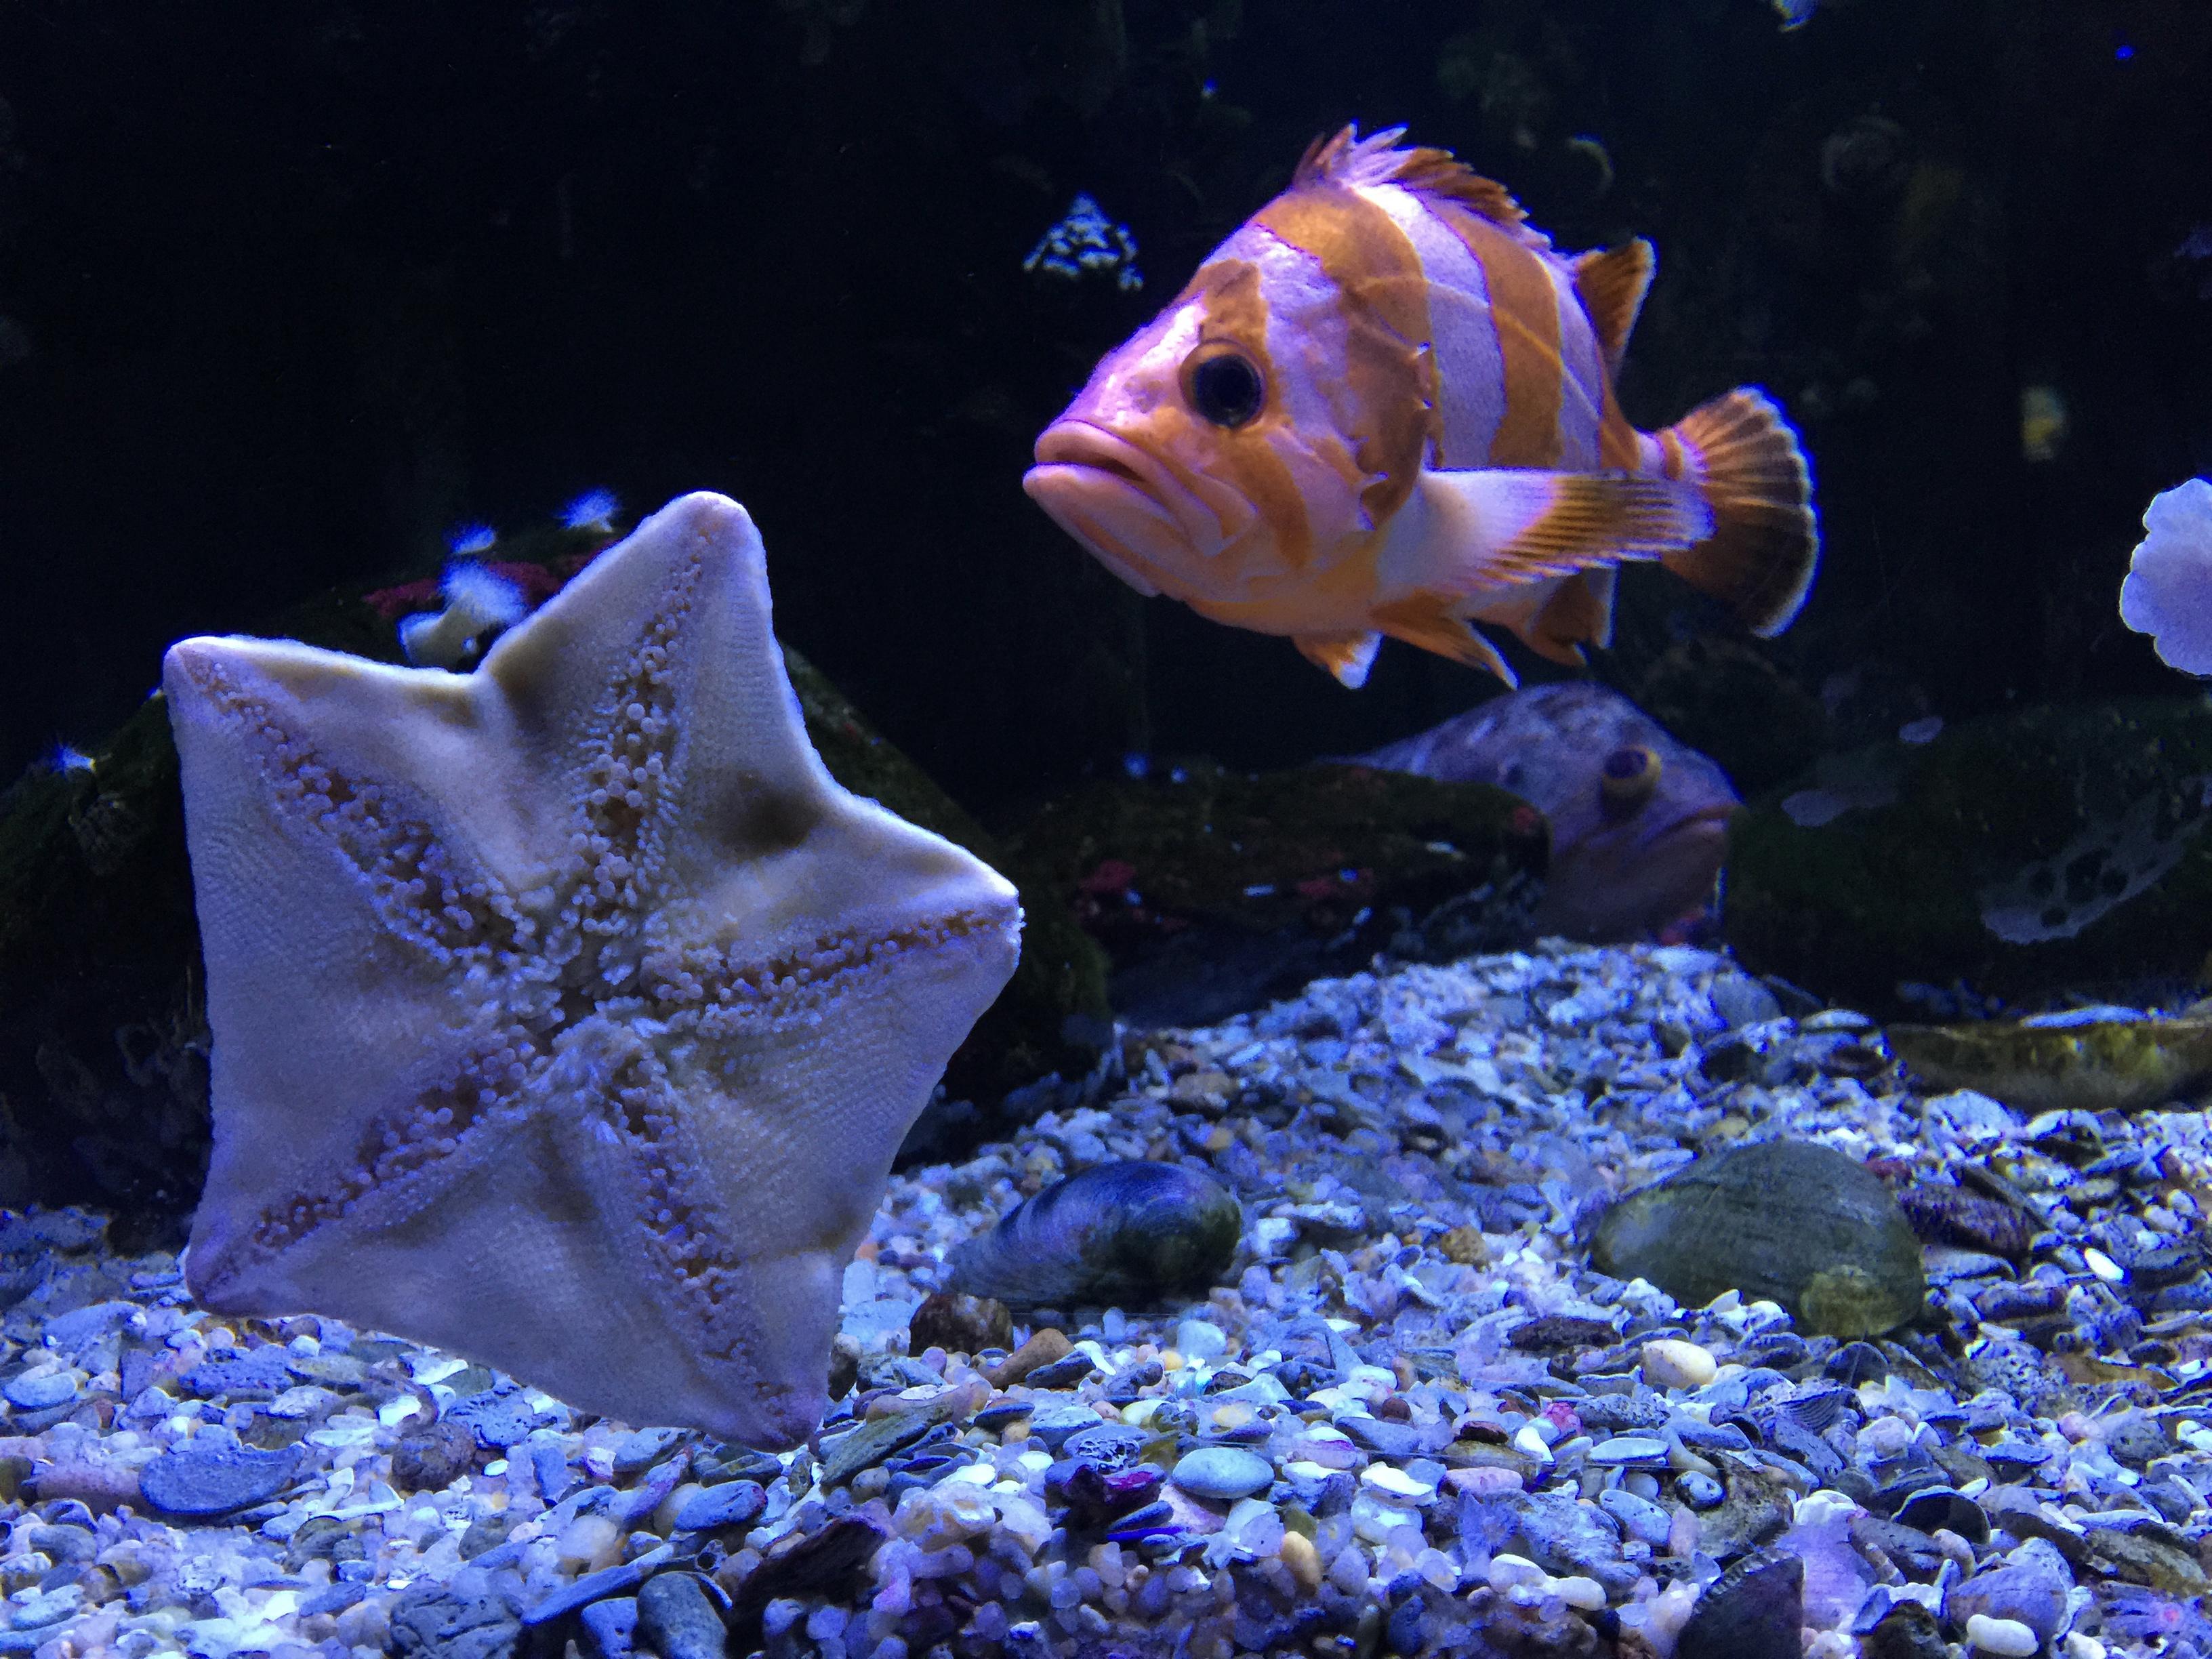 A weekend in myrtle beach south carolina full time explorer - Aquarium nemo ...